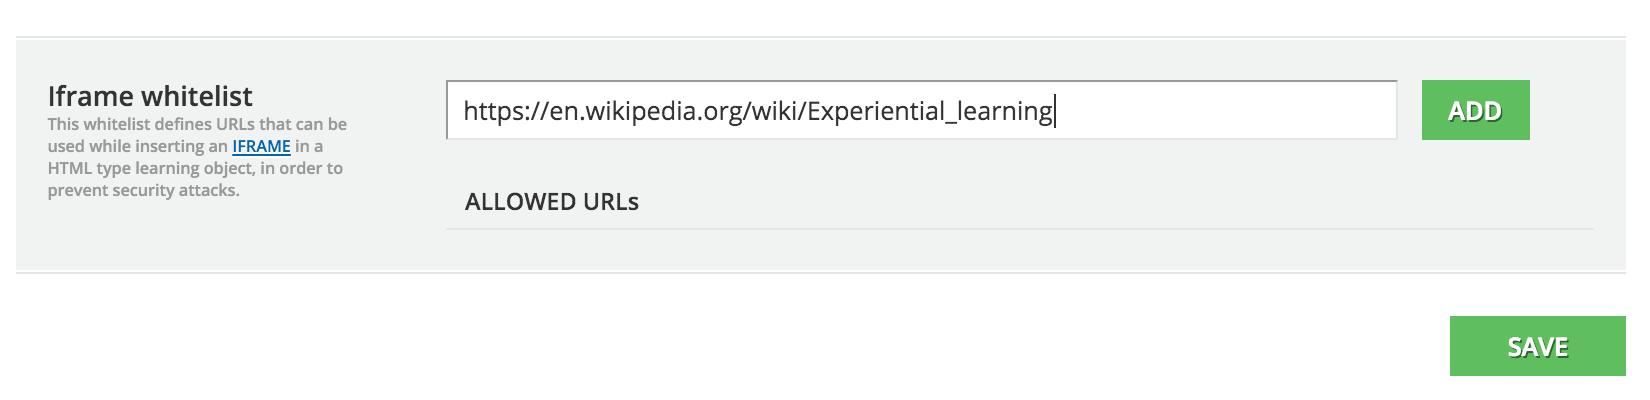 html page Advanced settings